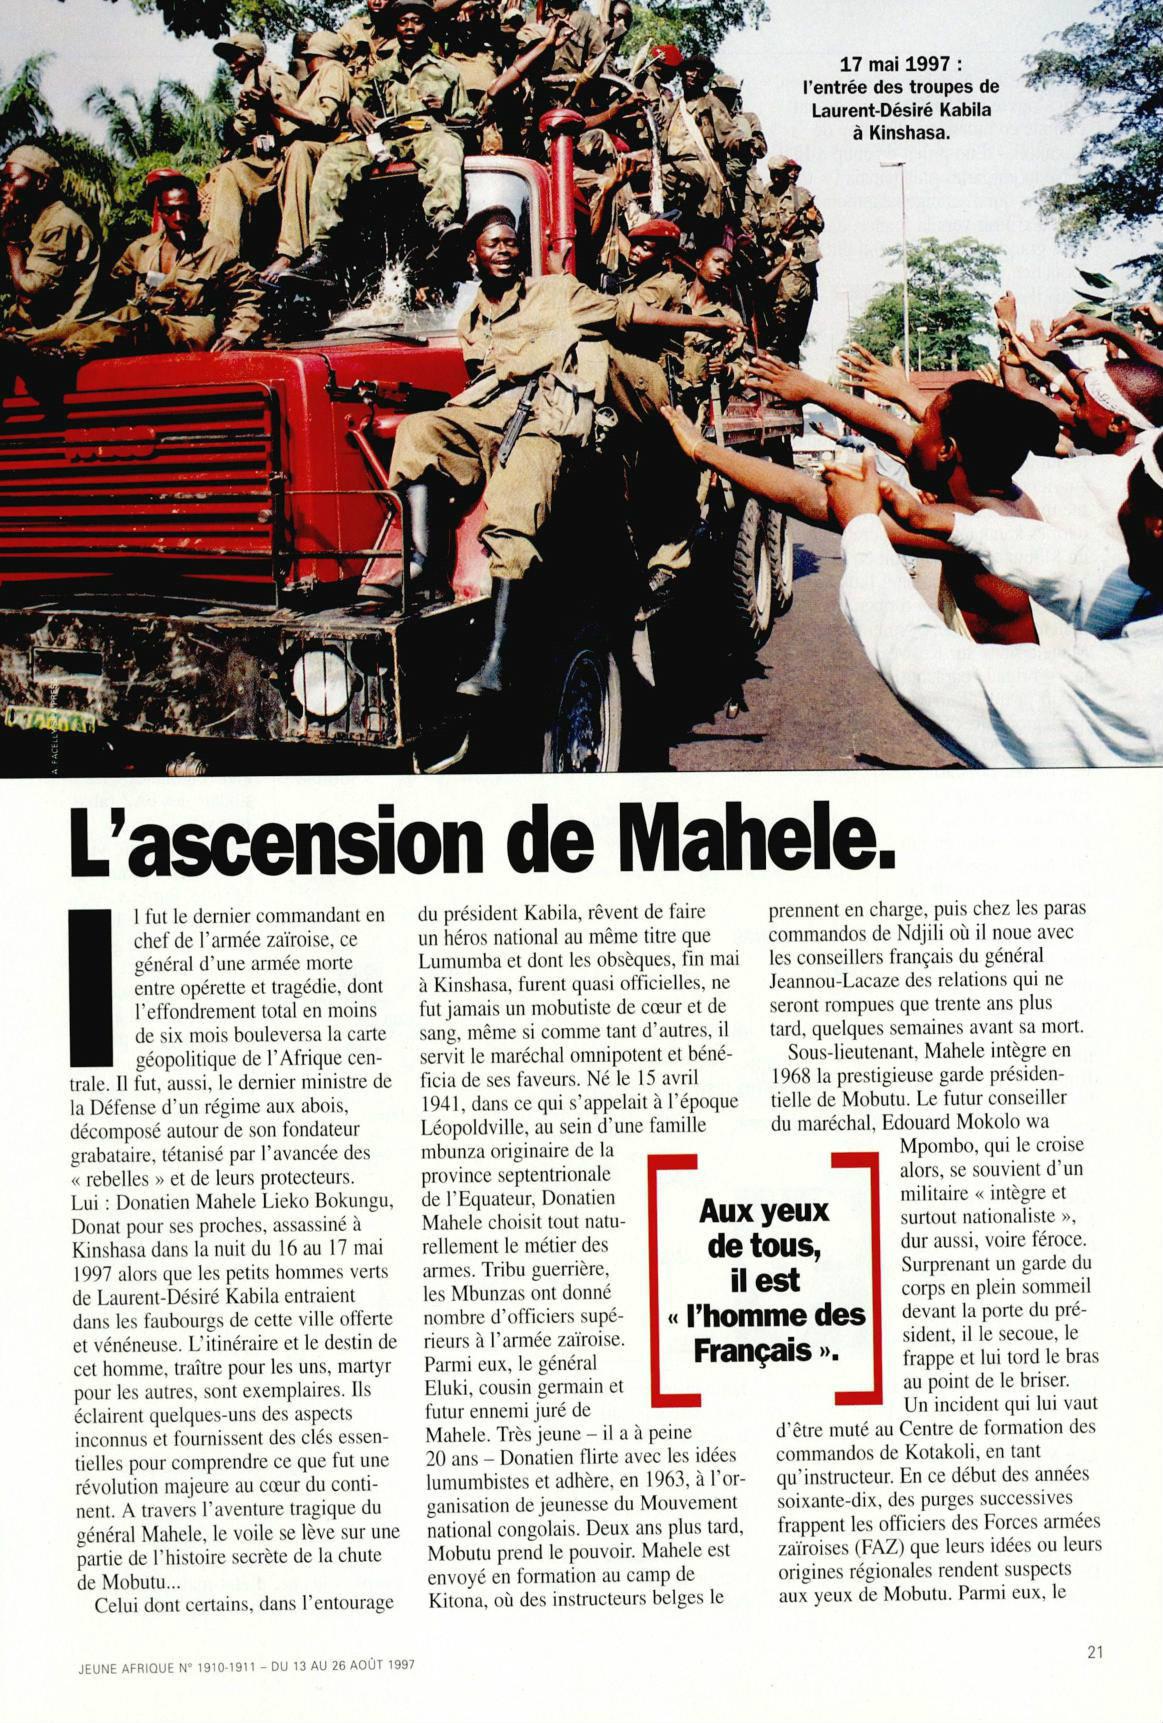 la chute de mobutu